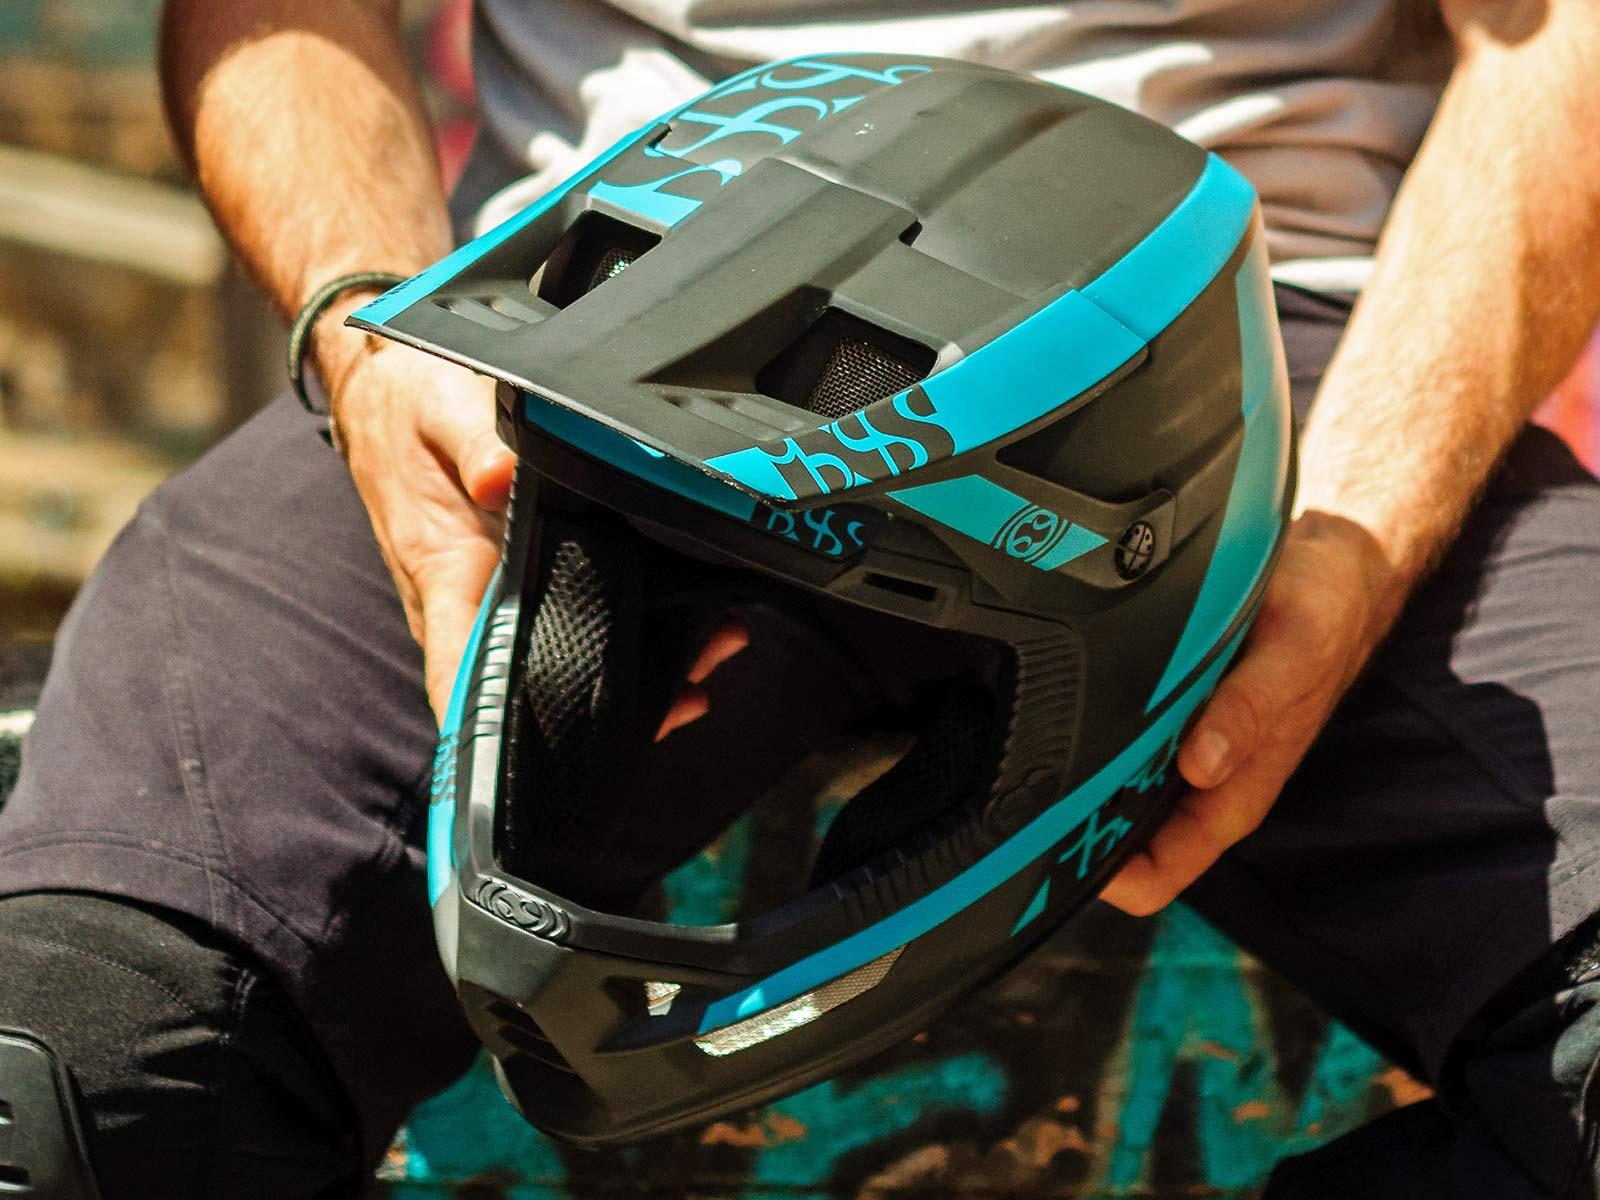 iXS Xult DH full face helmet, lightweight downhill race protection,front